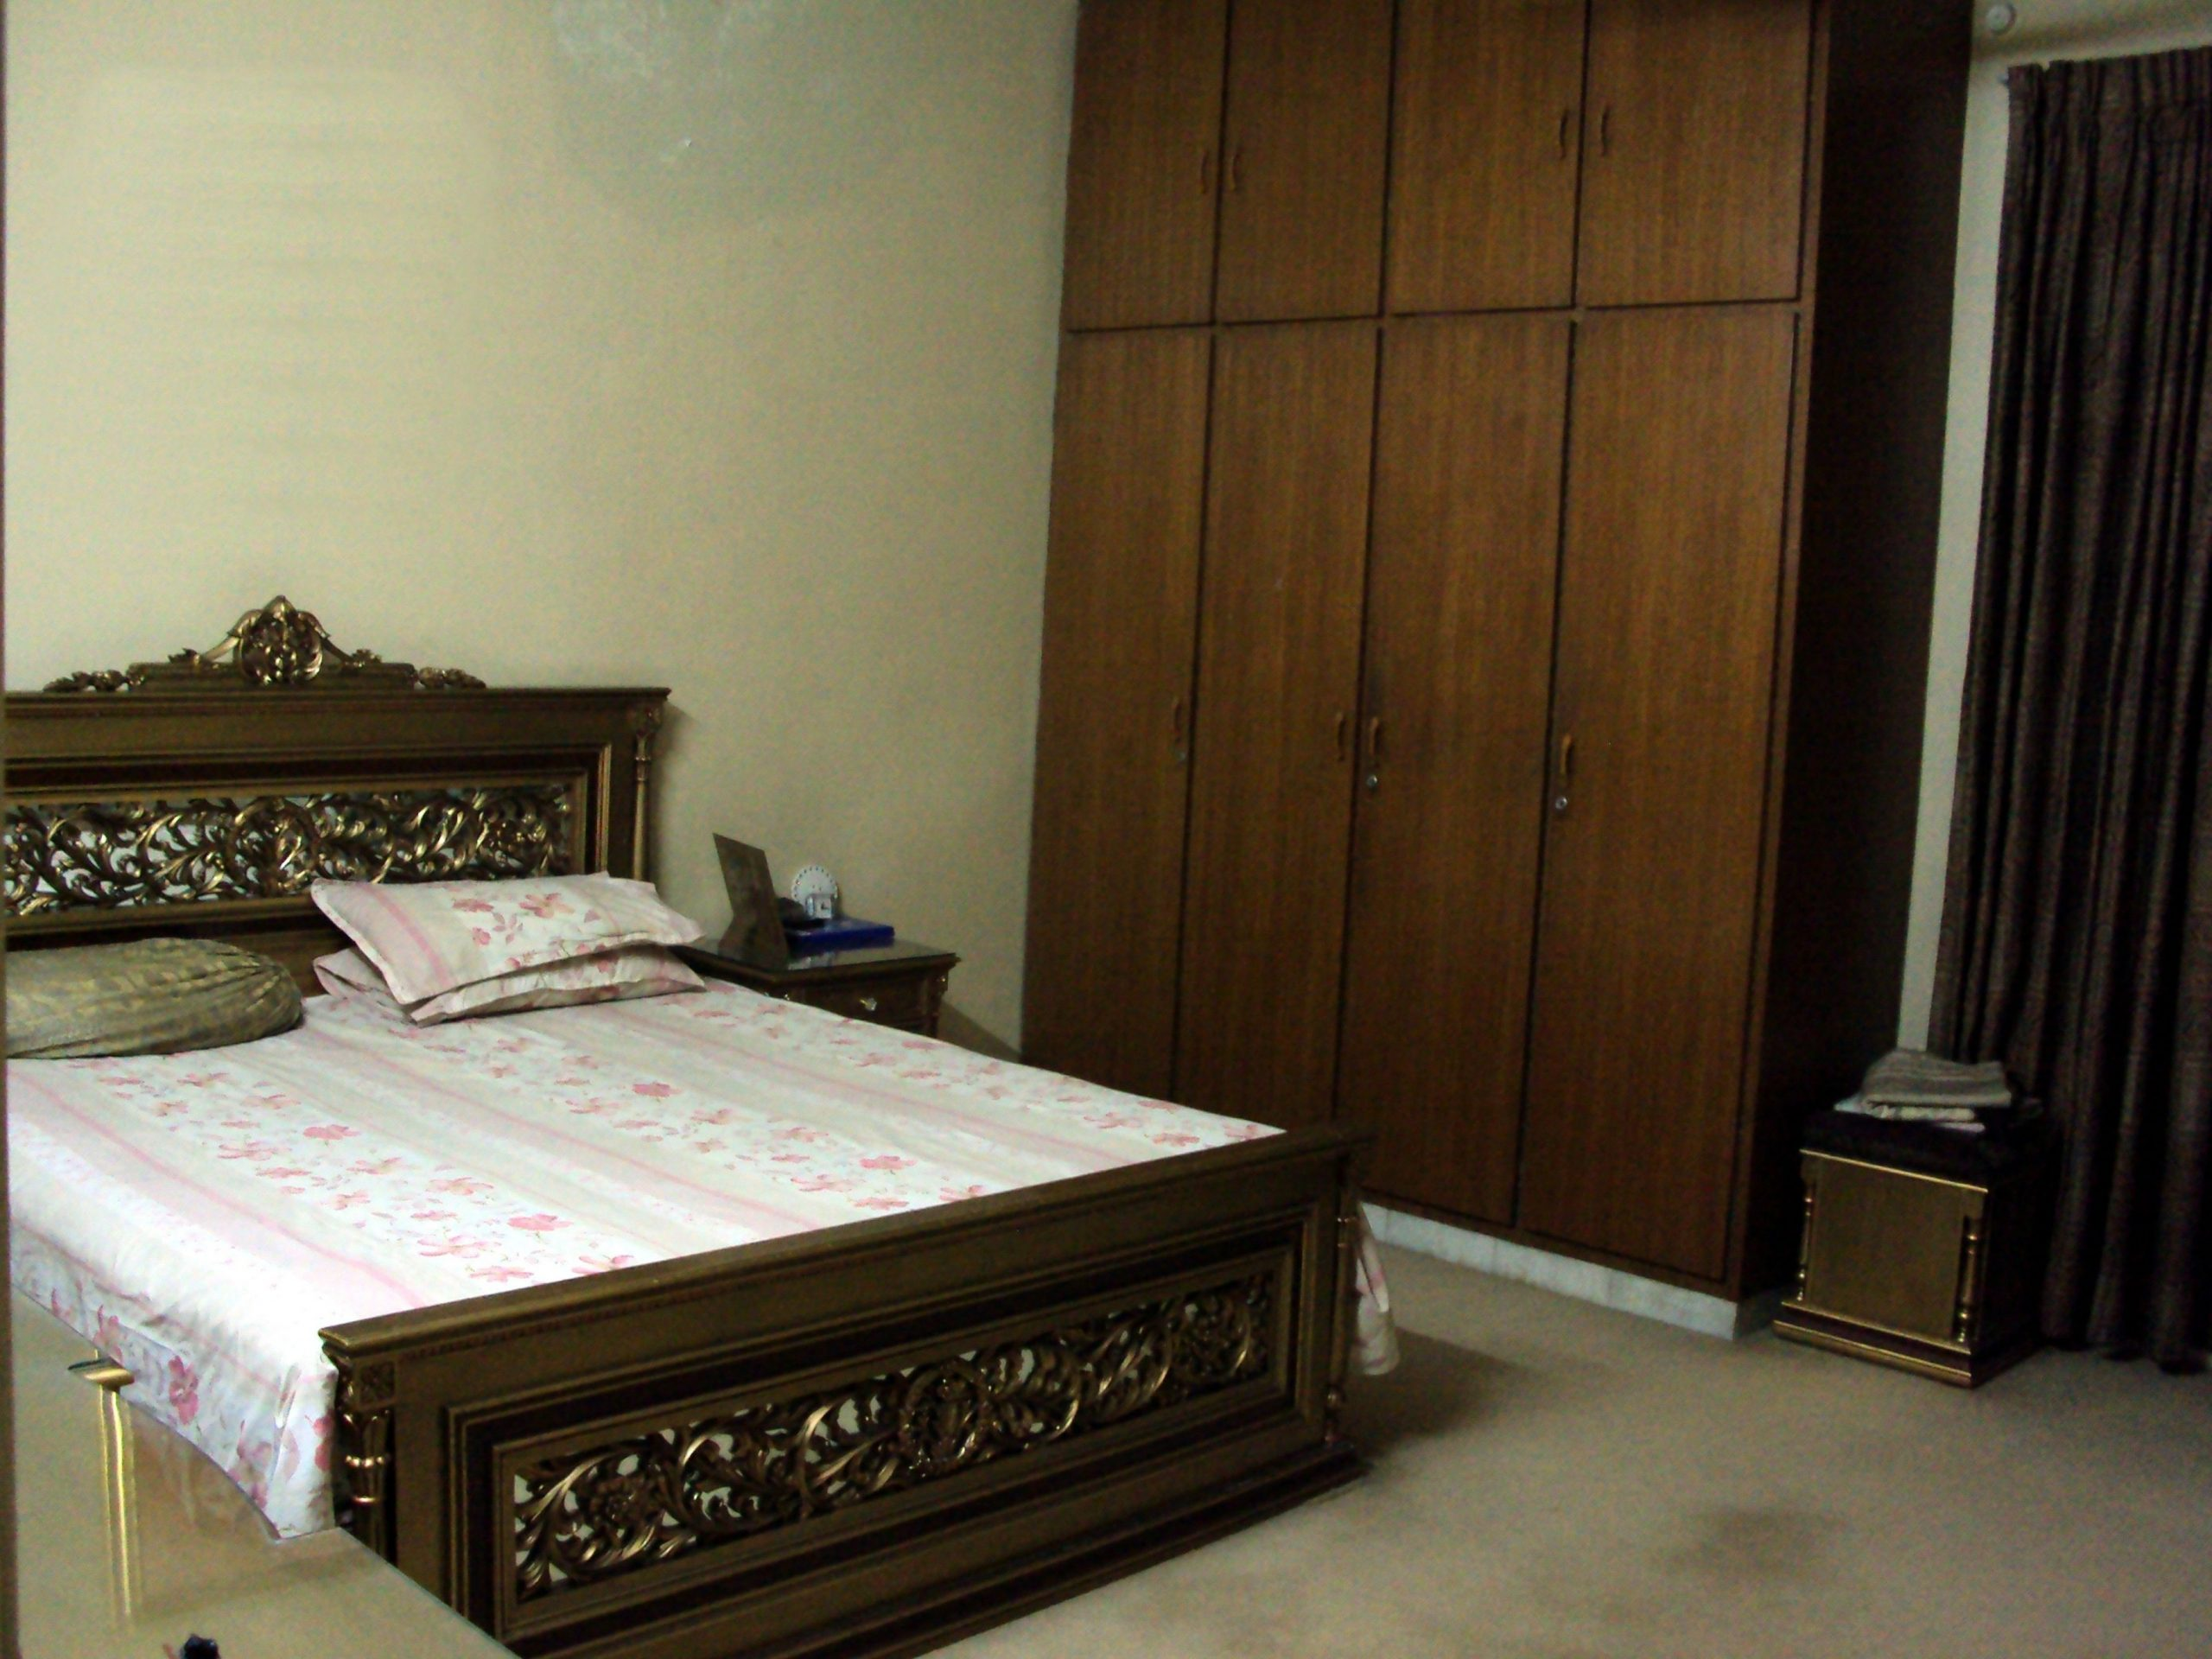 Bedroom Decoration Ideas In Pakistan - Bedroom Ideas In Pakistan